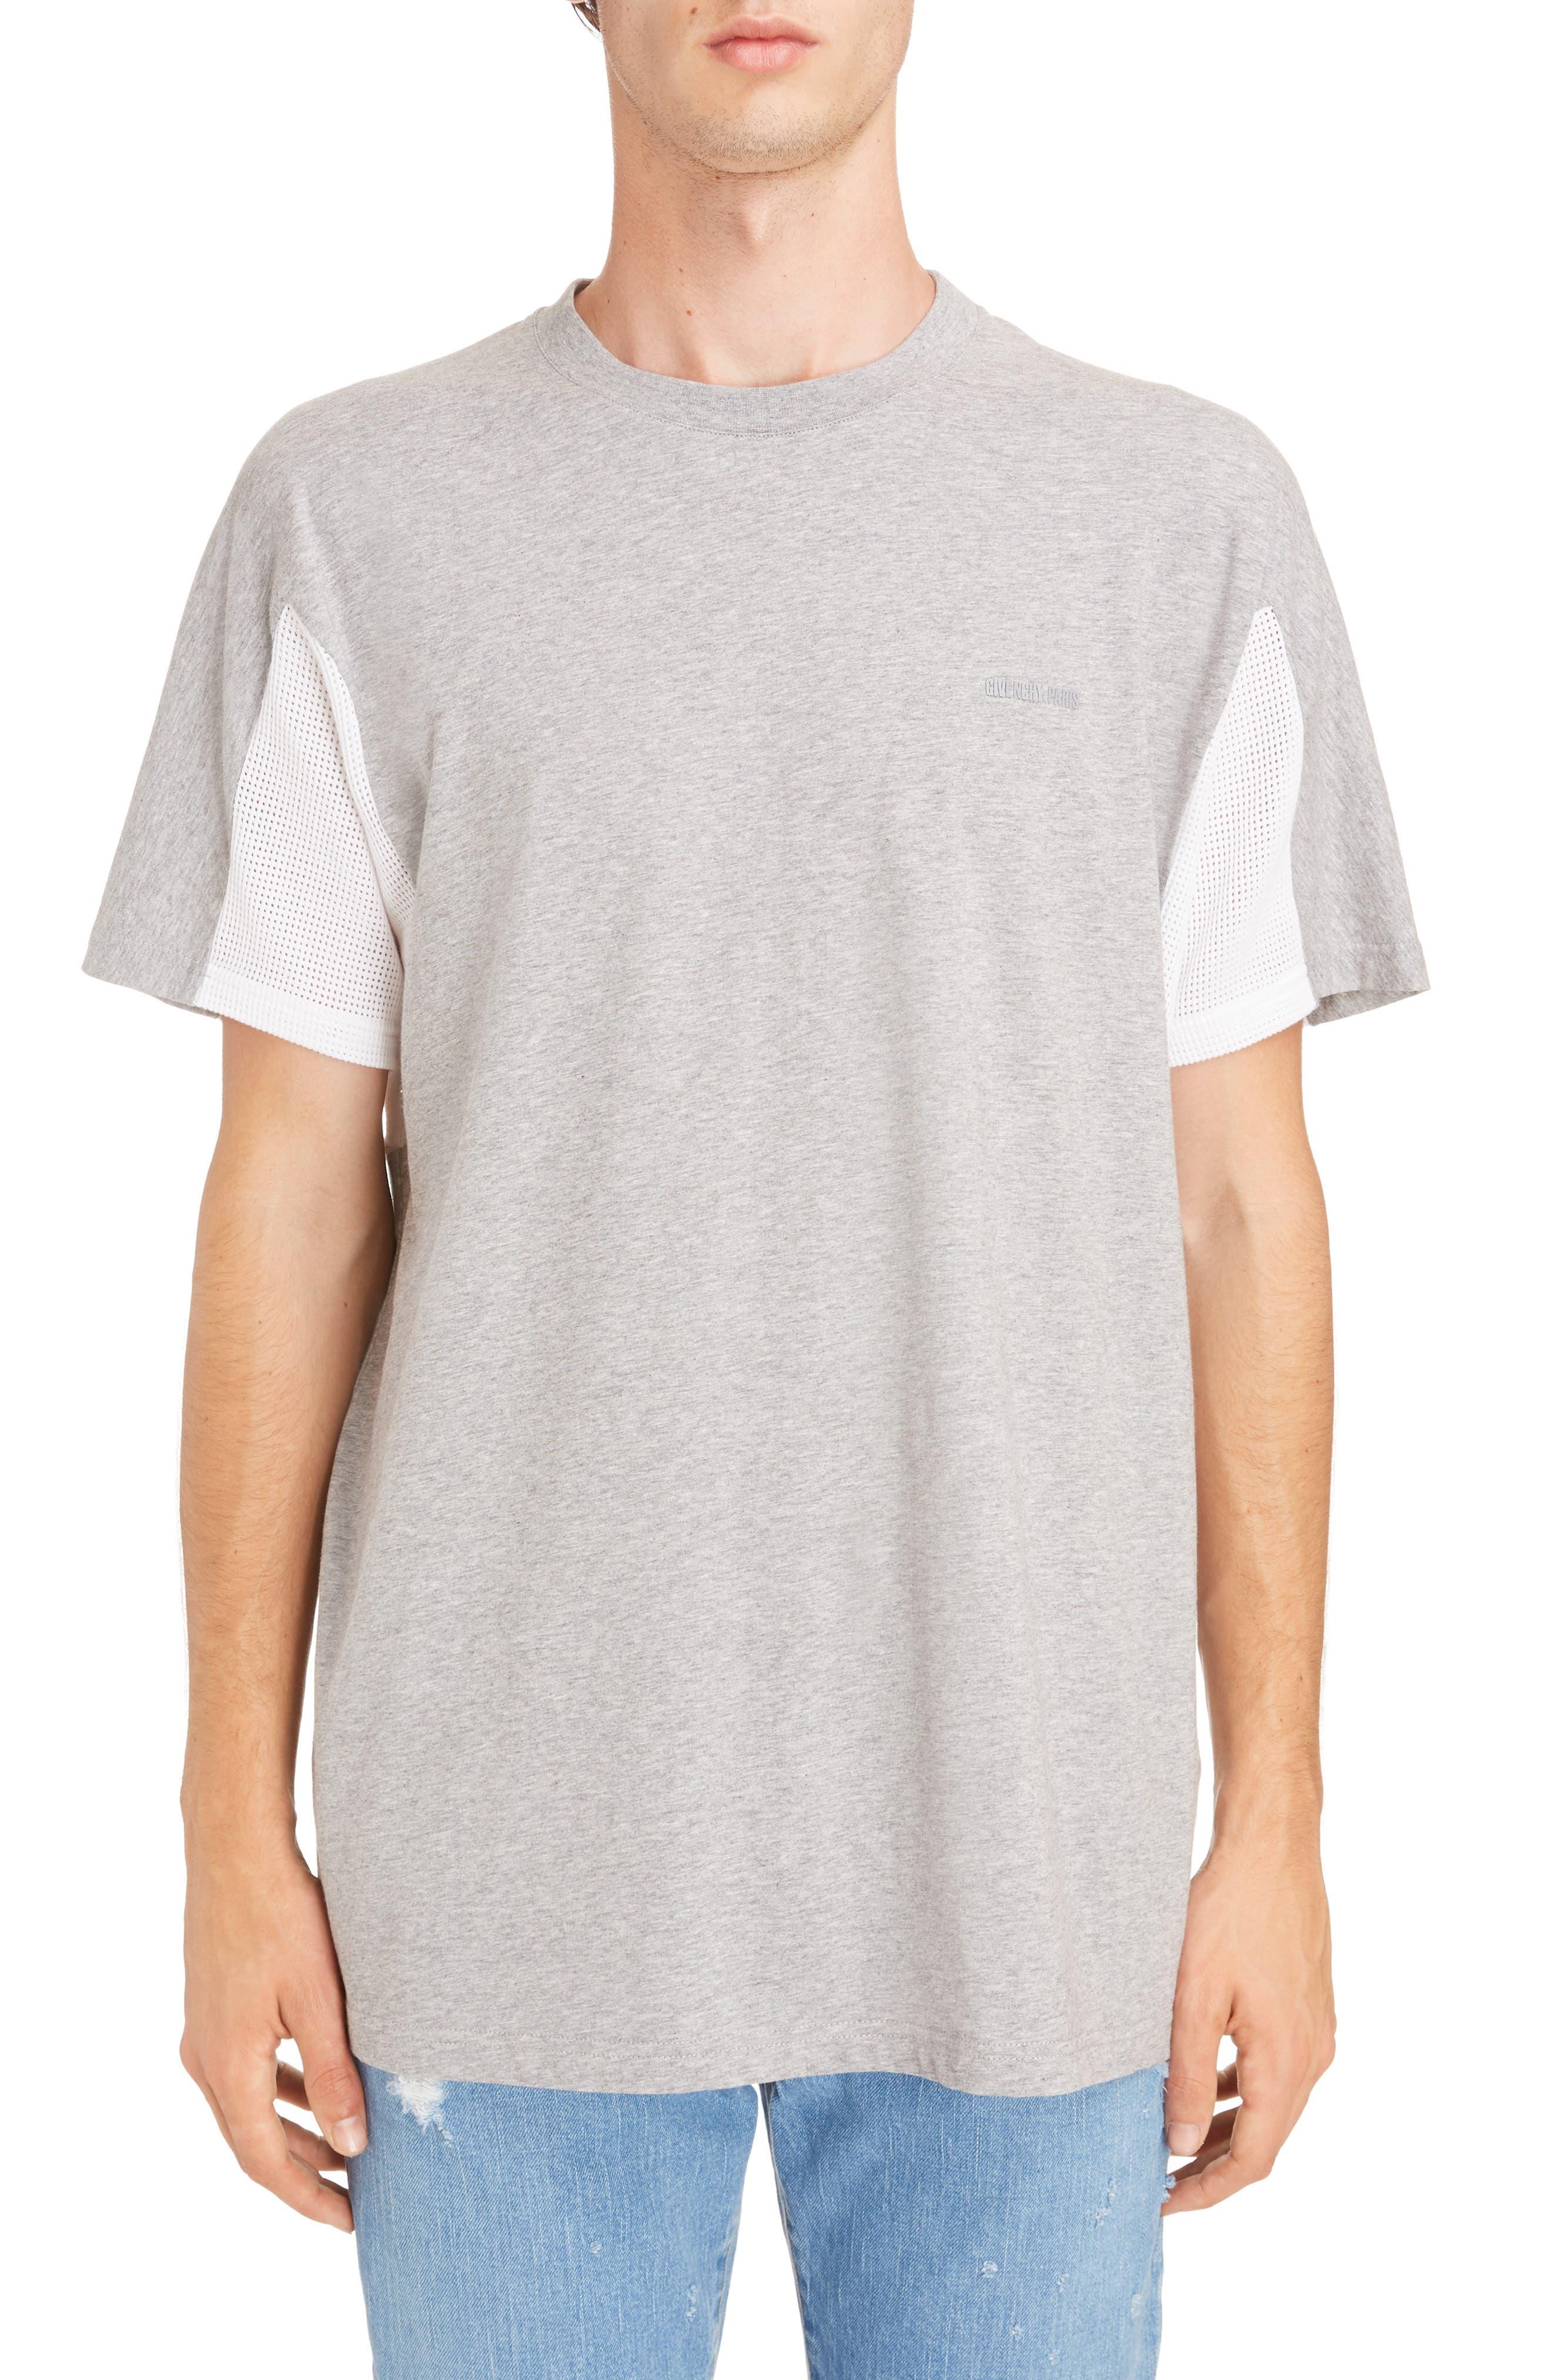 Main Image - Givenchy Mesh Jersey Crewneck T-Shirt